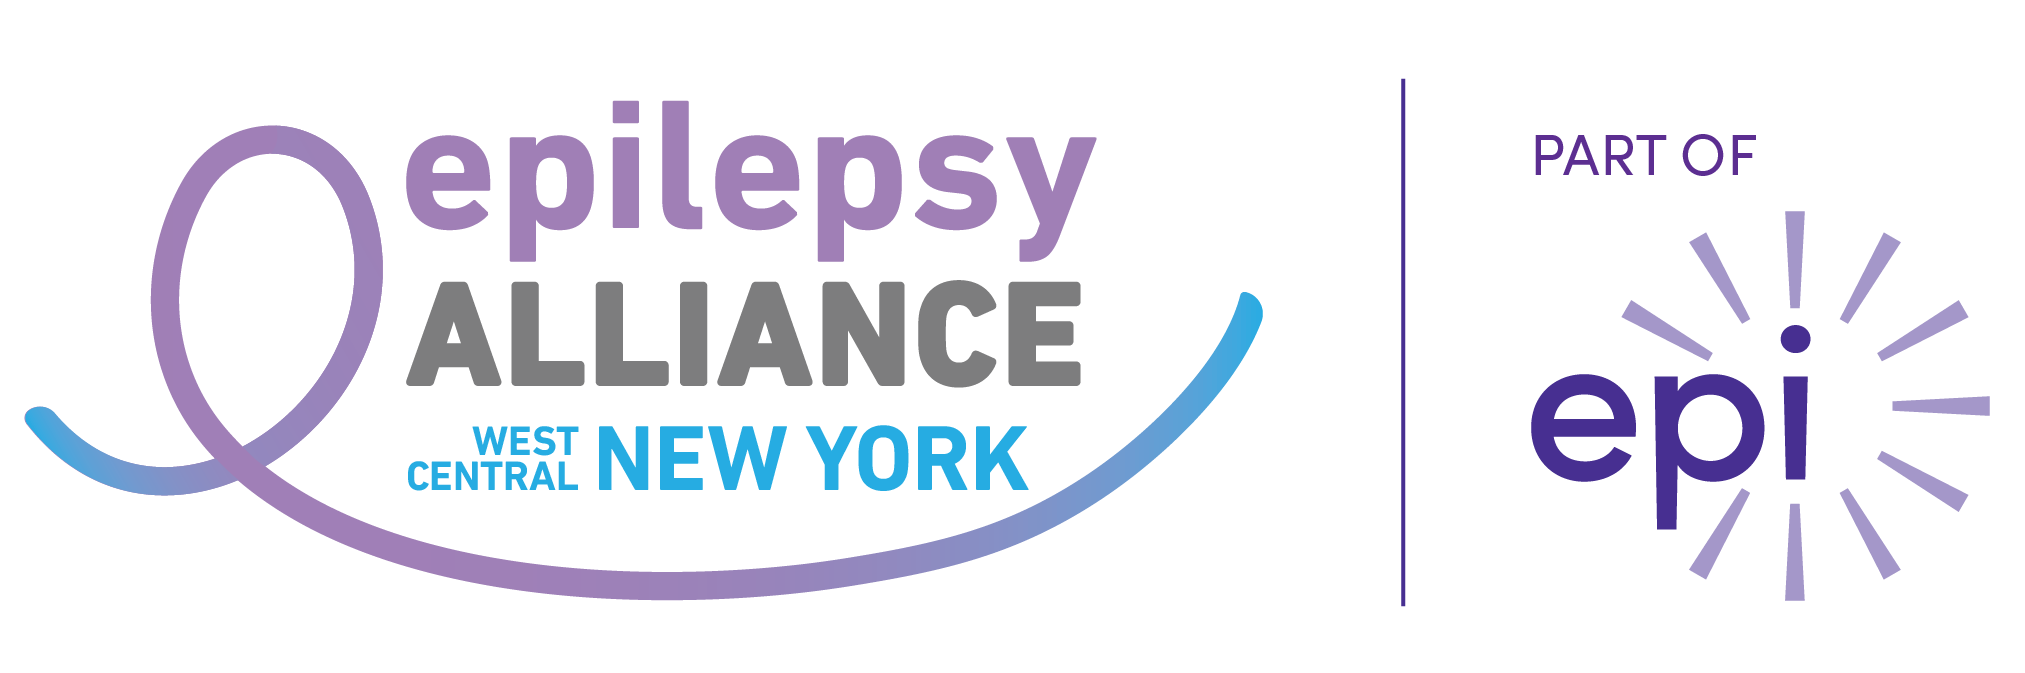 Epilepsy Alliance